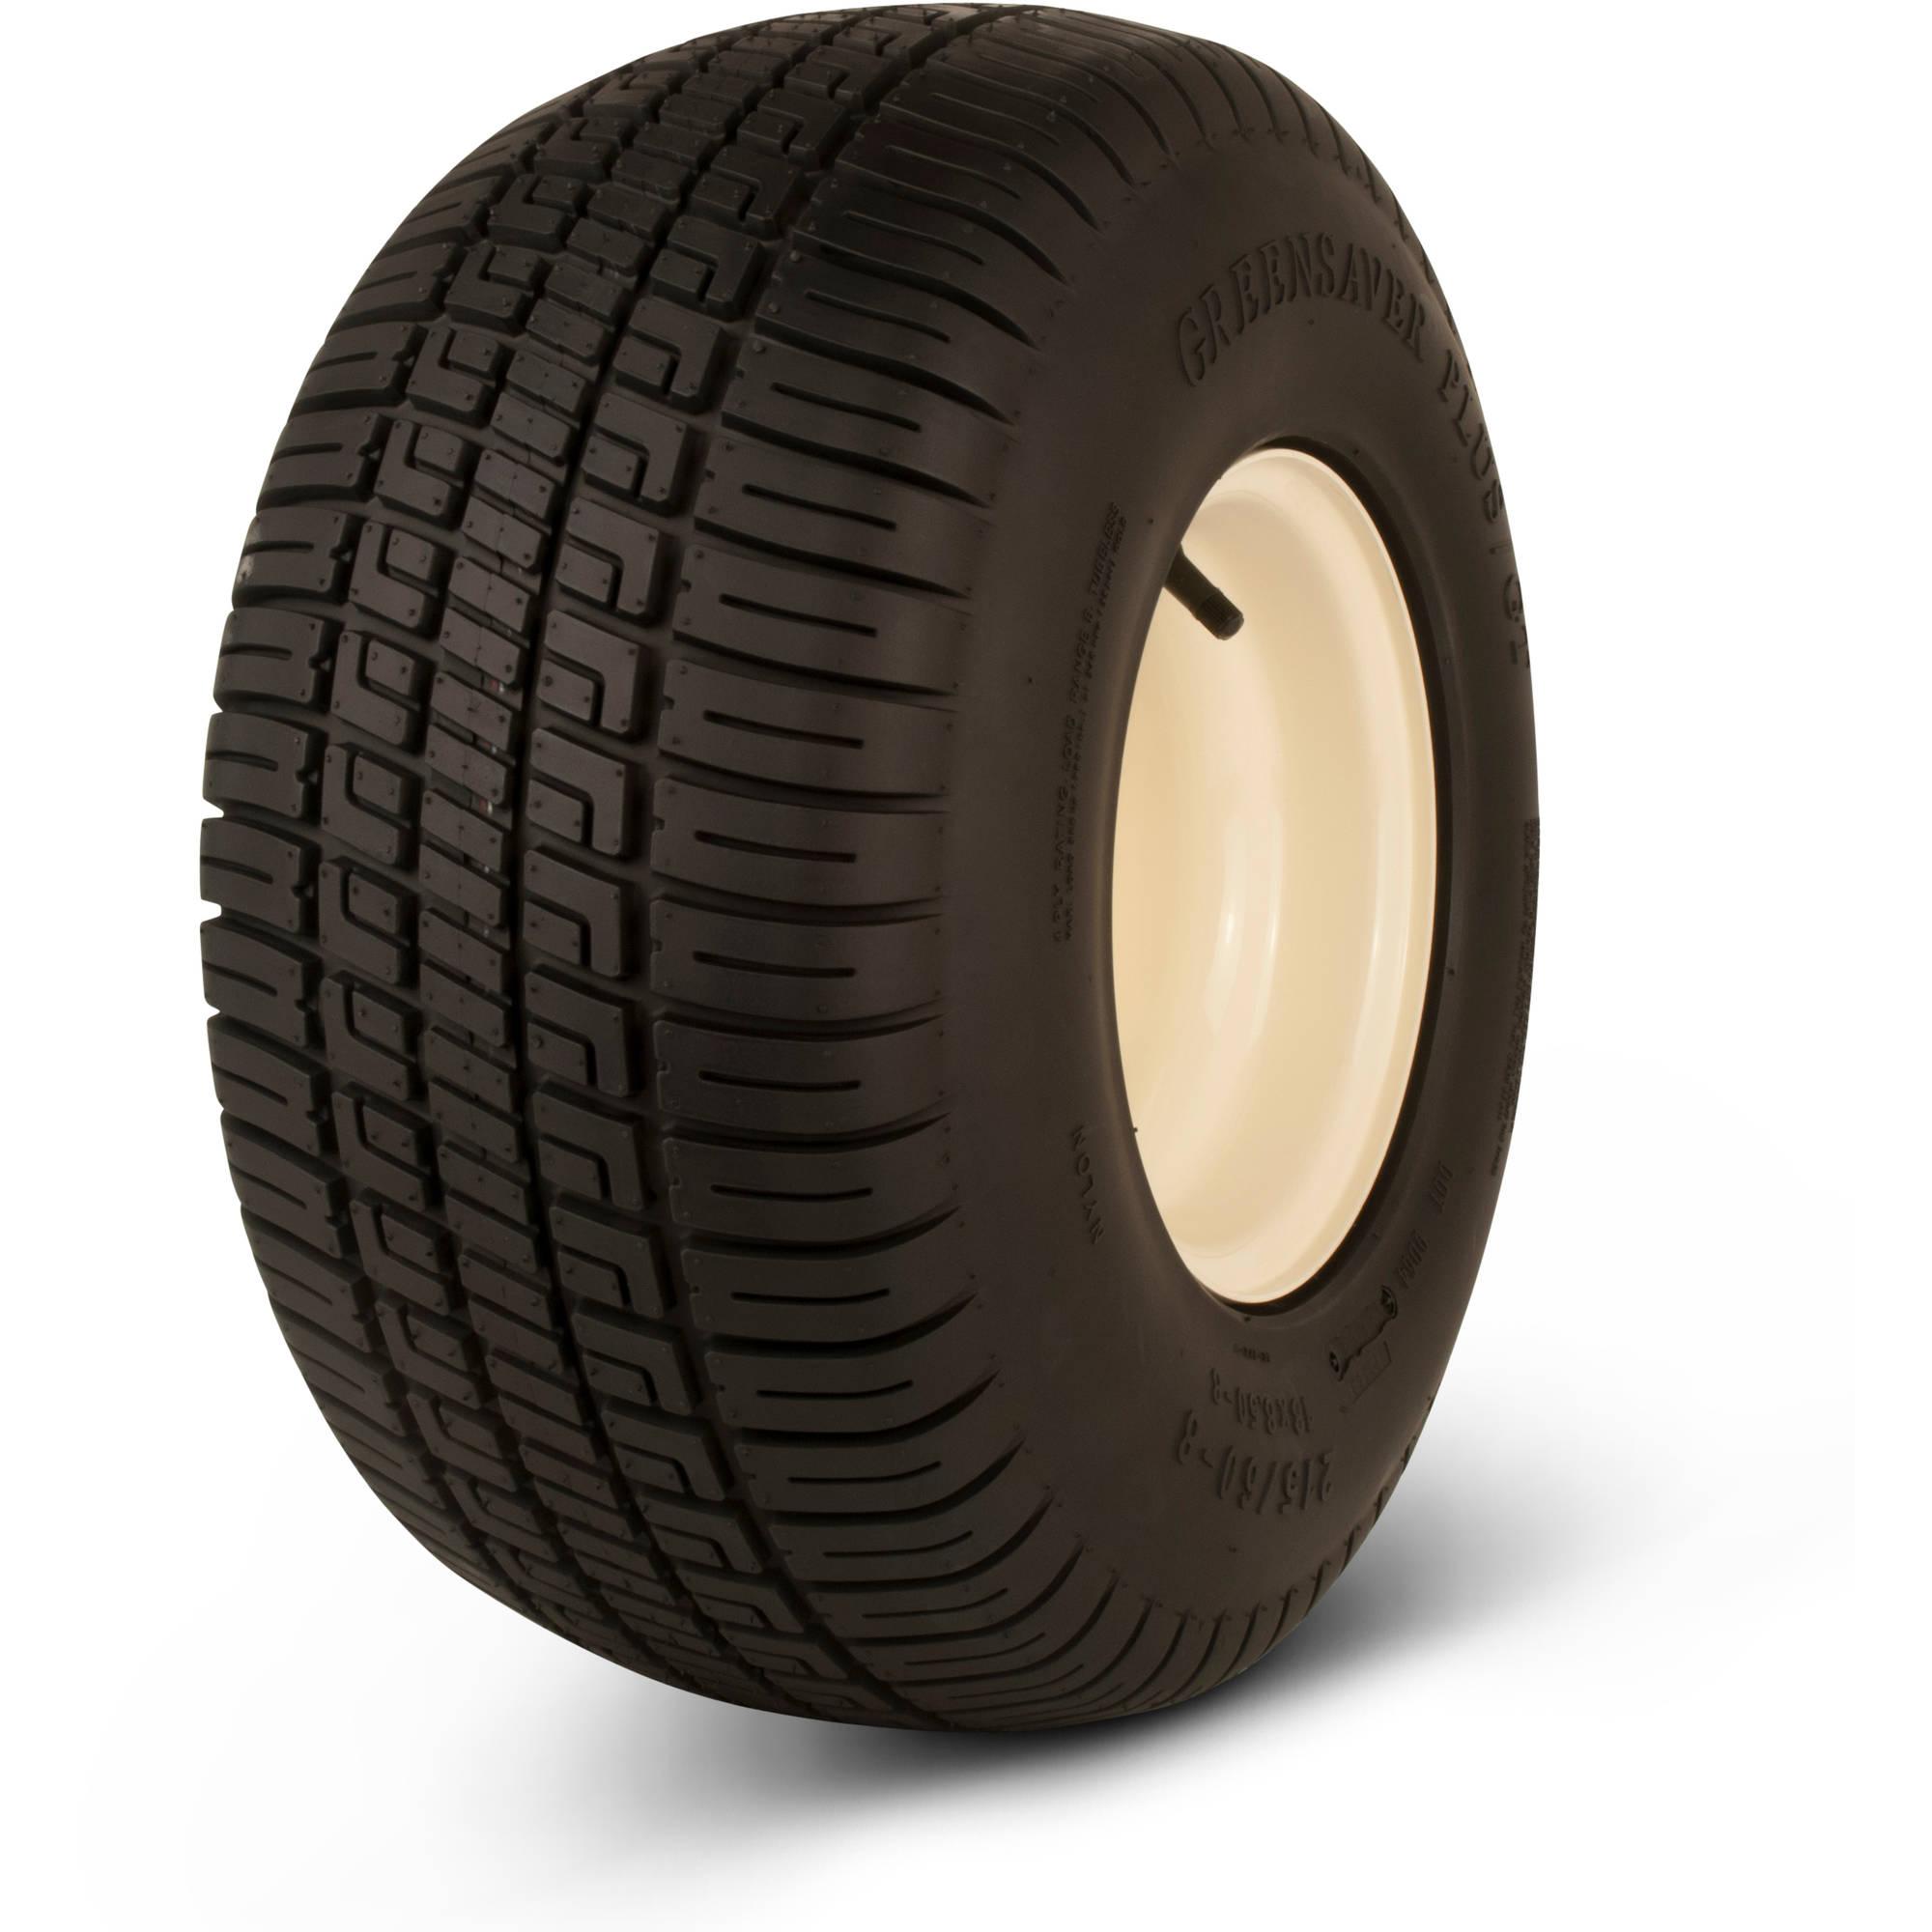 Greenball Greensaver Plus GT 215/60-8 4-Ply Golf Cart Tire Tire and Wheel 4 Lug, Almond